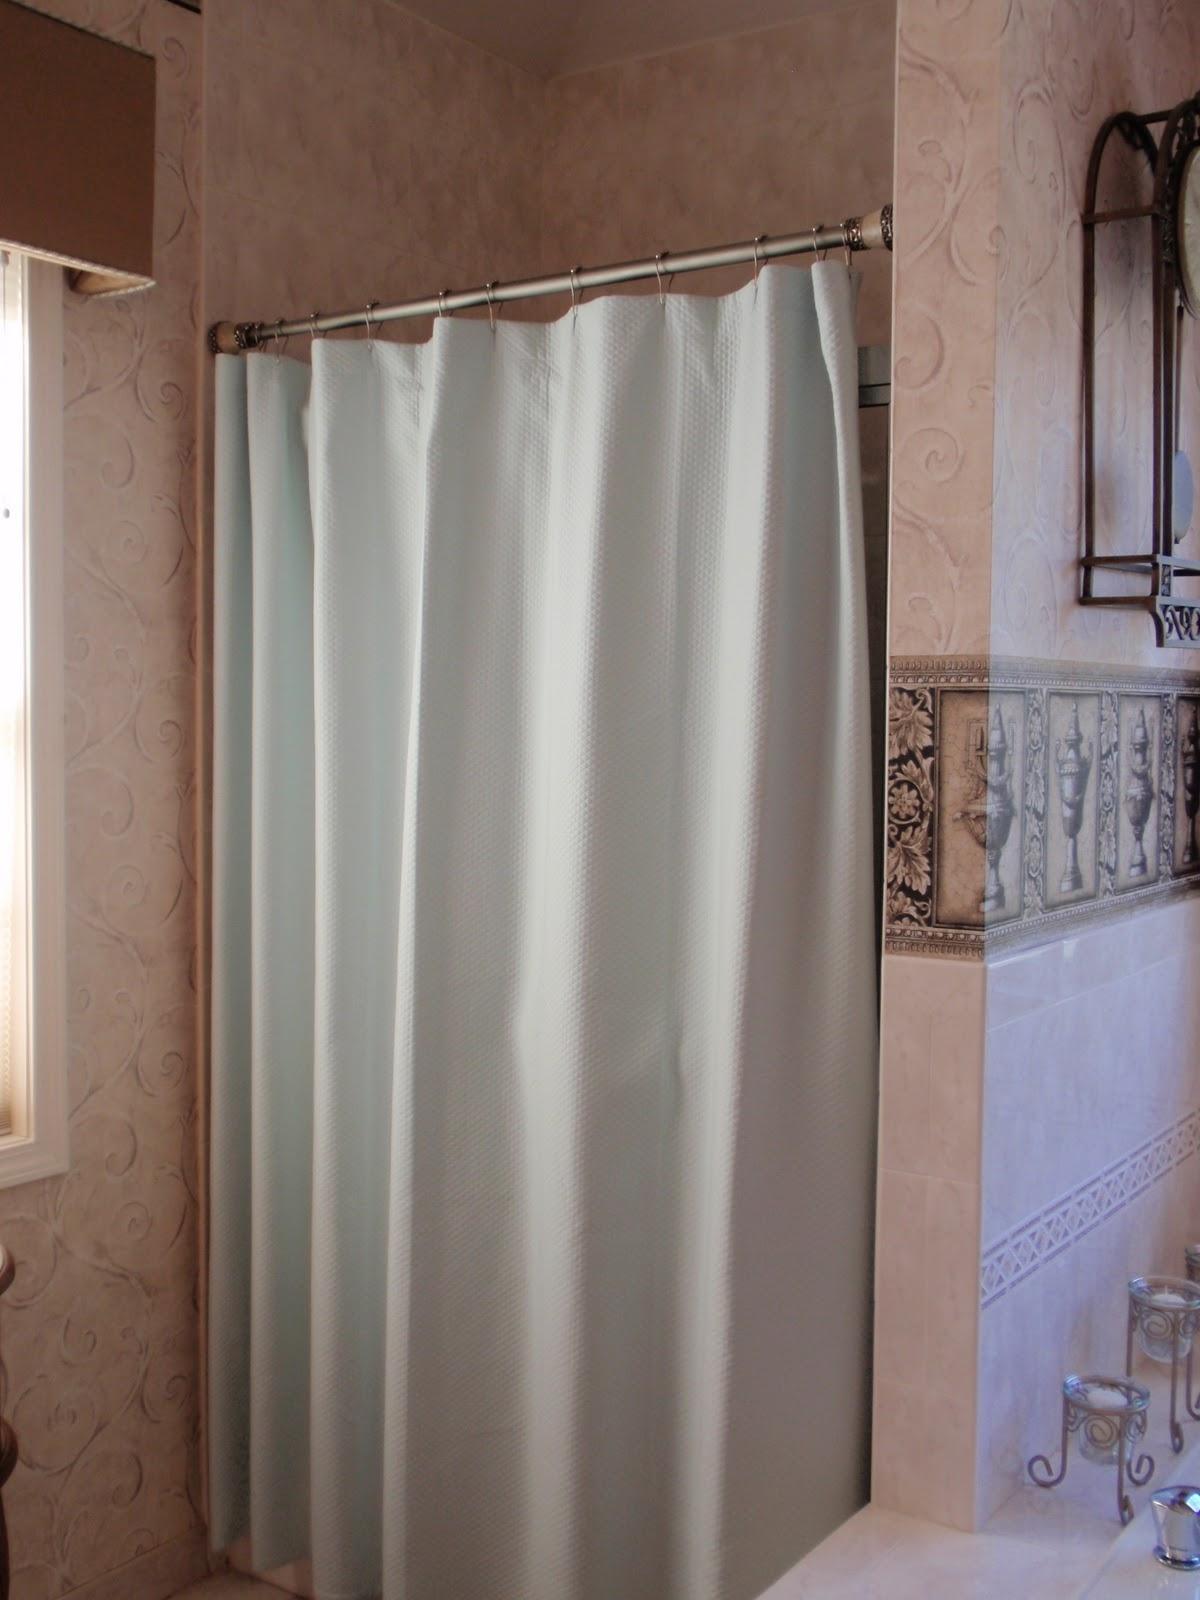 Shower Curtain From Restoration Harware